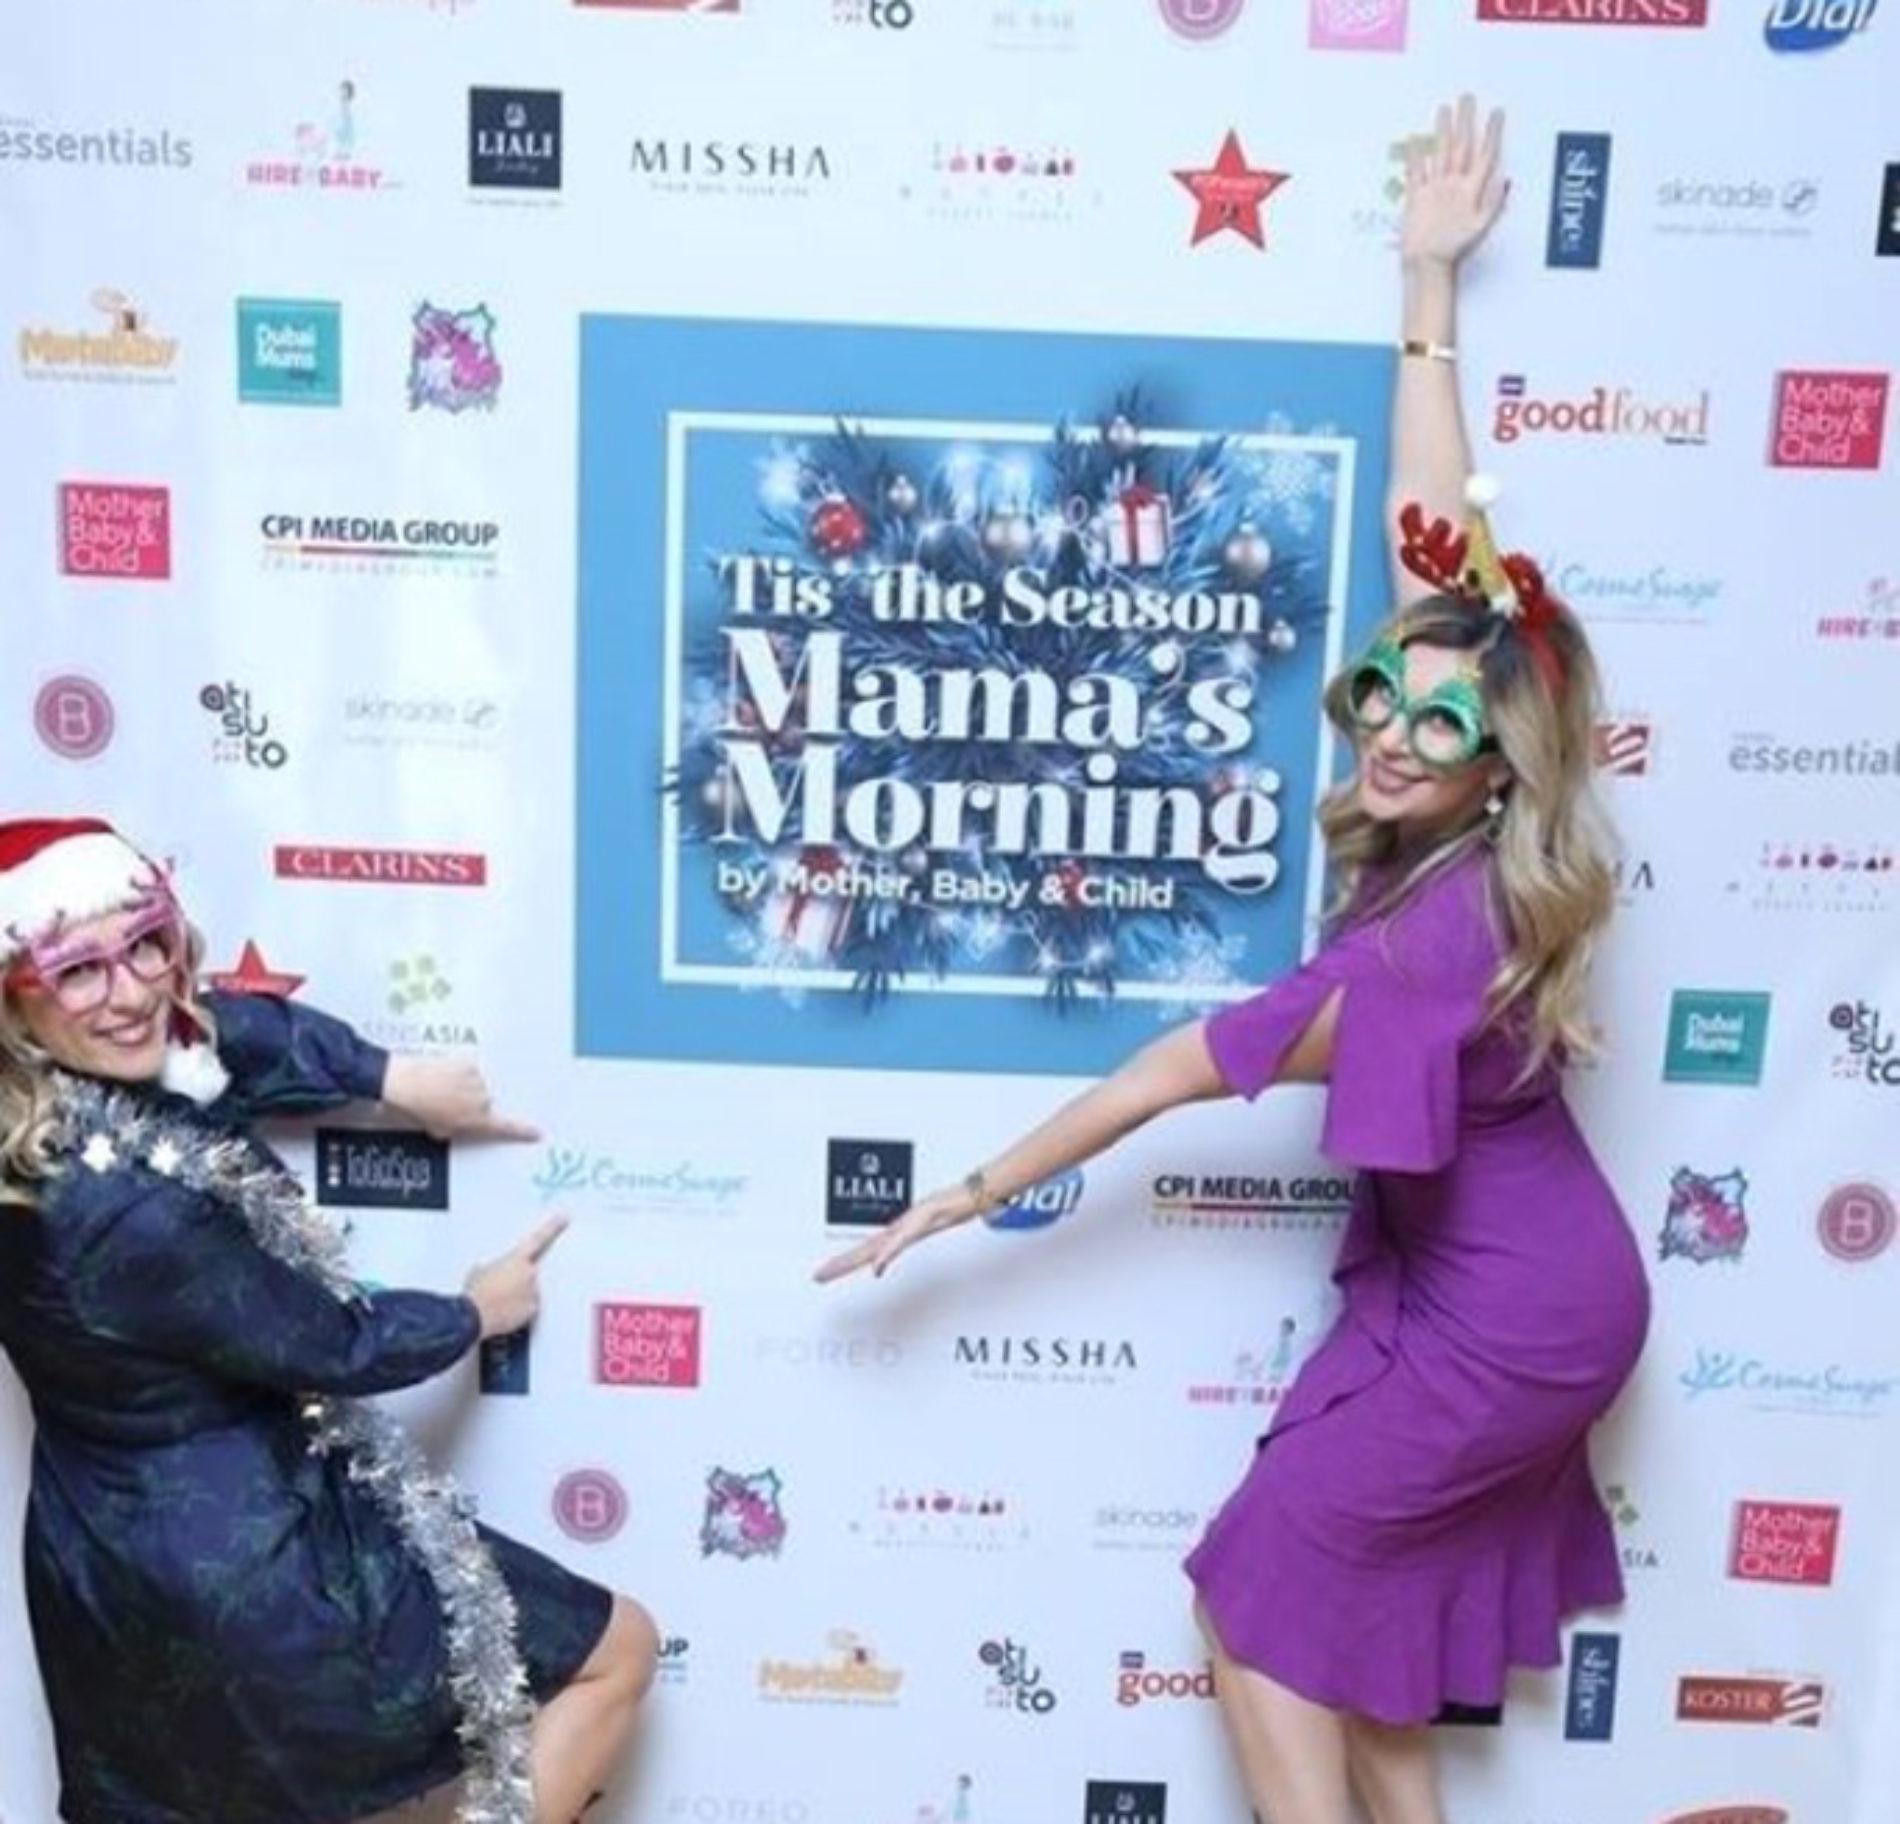 Tis' the Season Mama's Morning